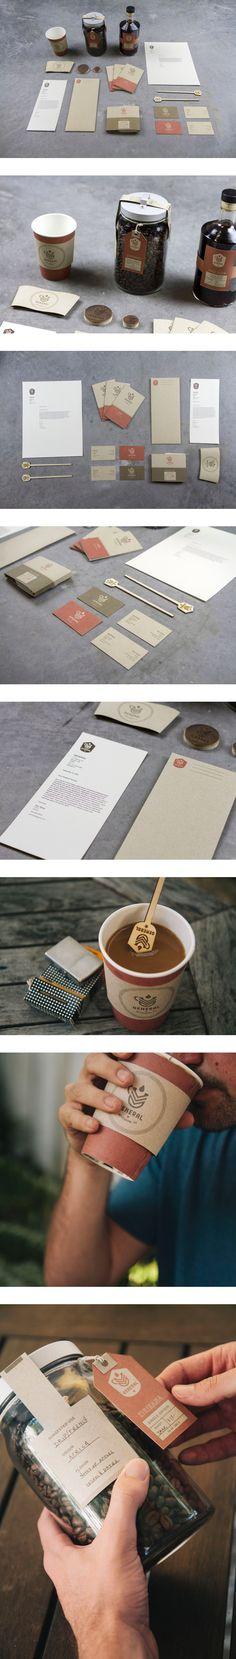 General Cafe by Clarke Harris, ID system  via Behance